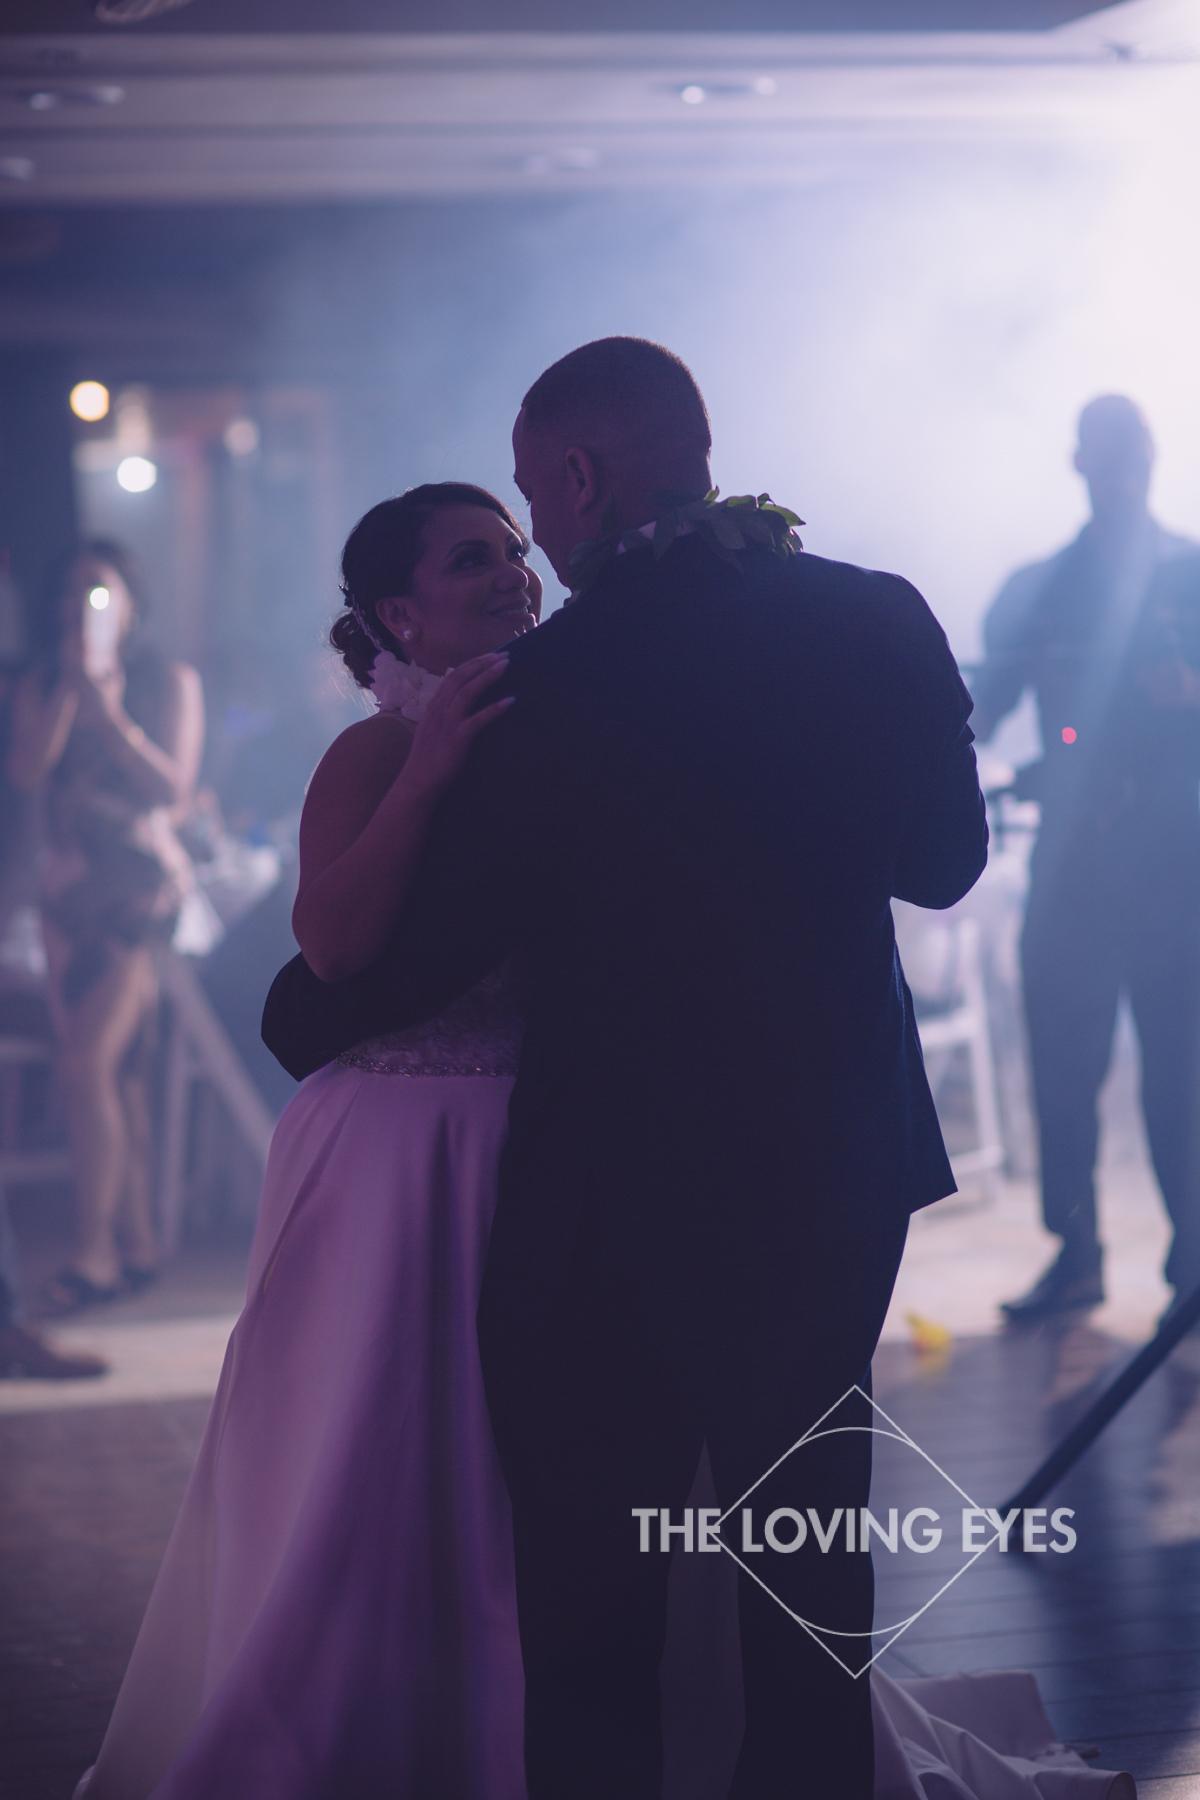 First Dance as Bride and Groom on wedding day at Hilton Hawaiian Village Rainbow Suite in Waikiki